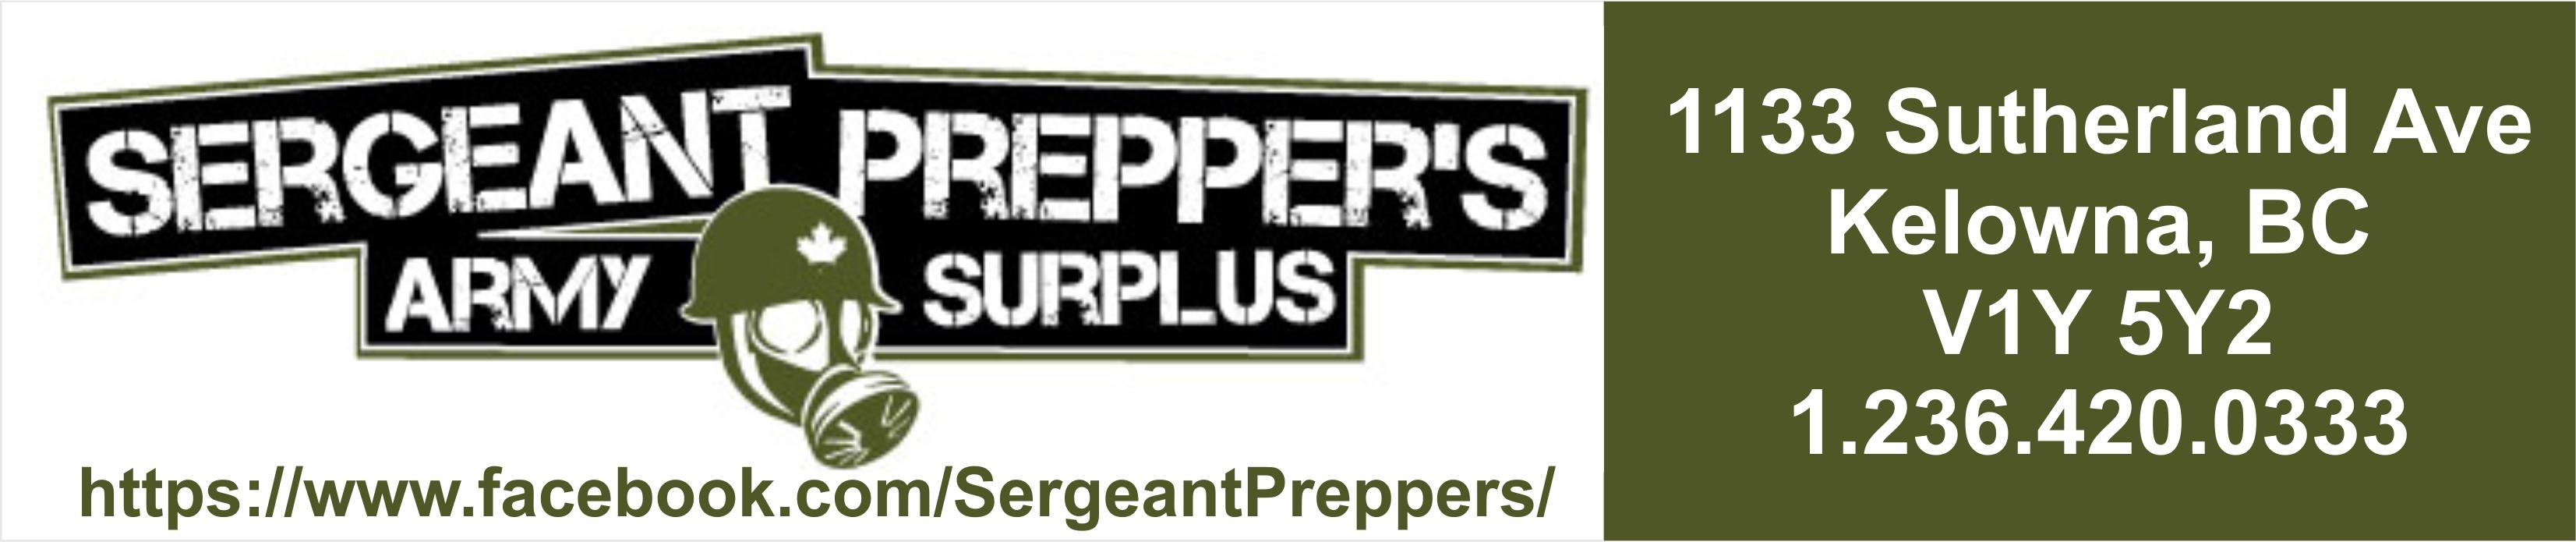 sergeant-preppers-logo.jpg